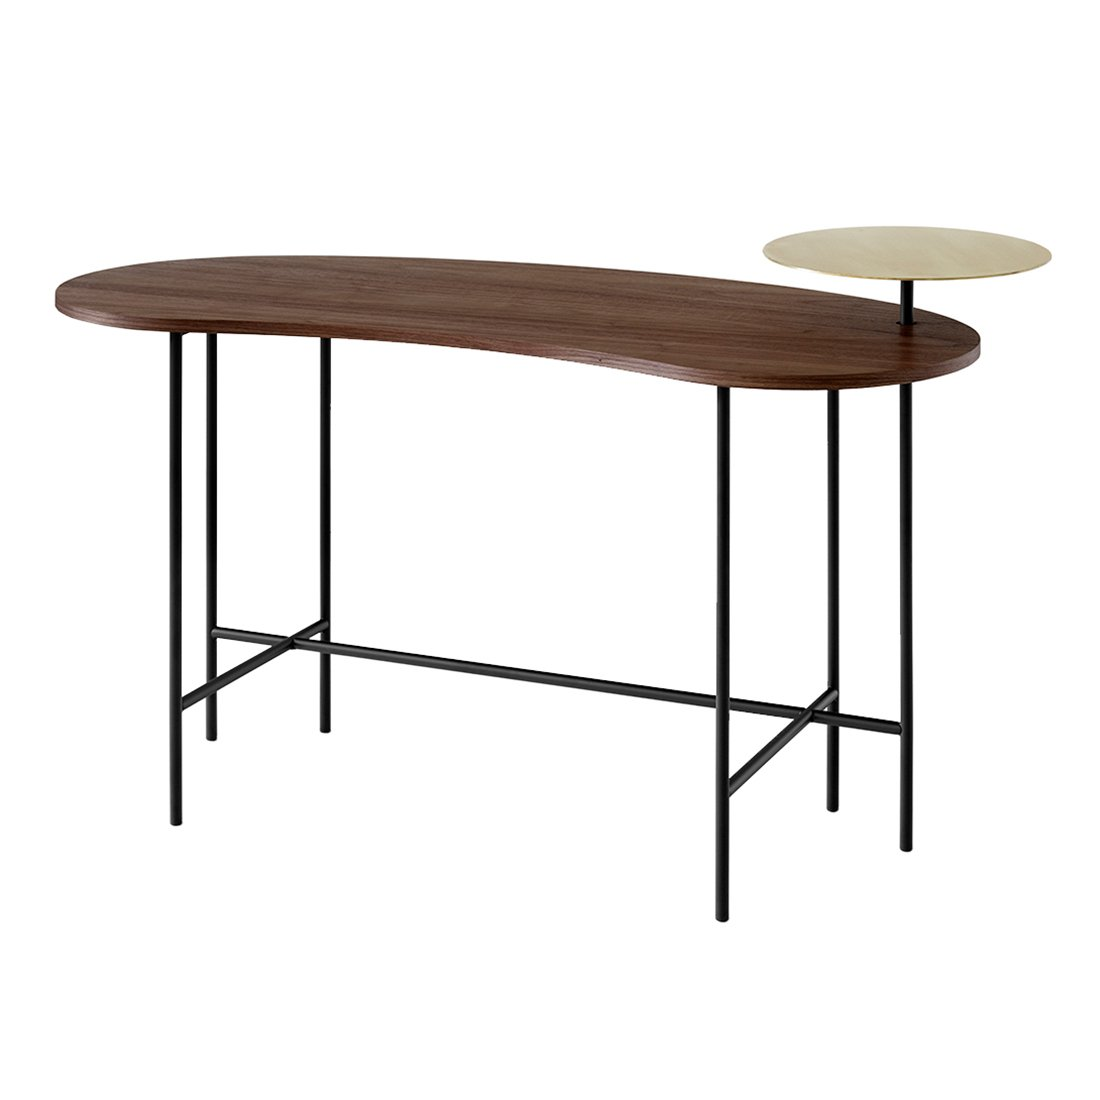 AndTradition Palette Desk JH9